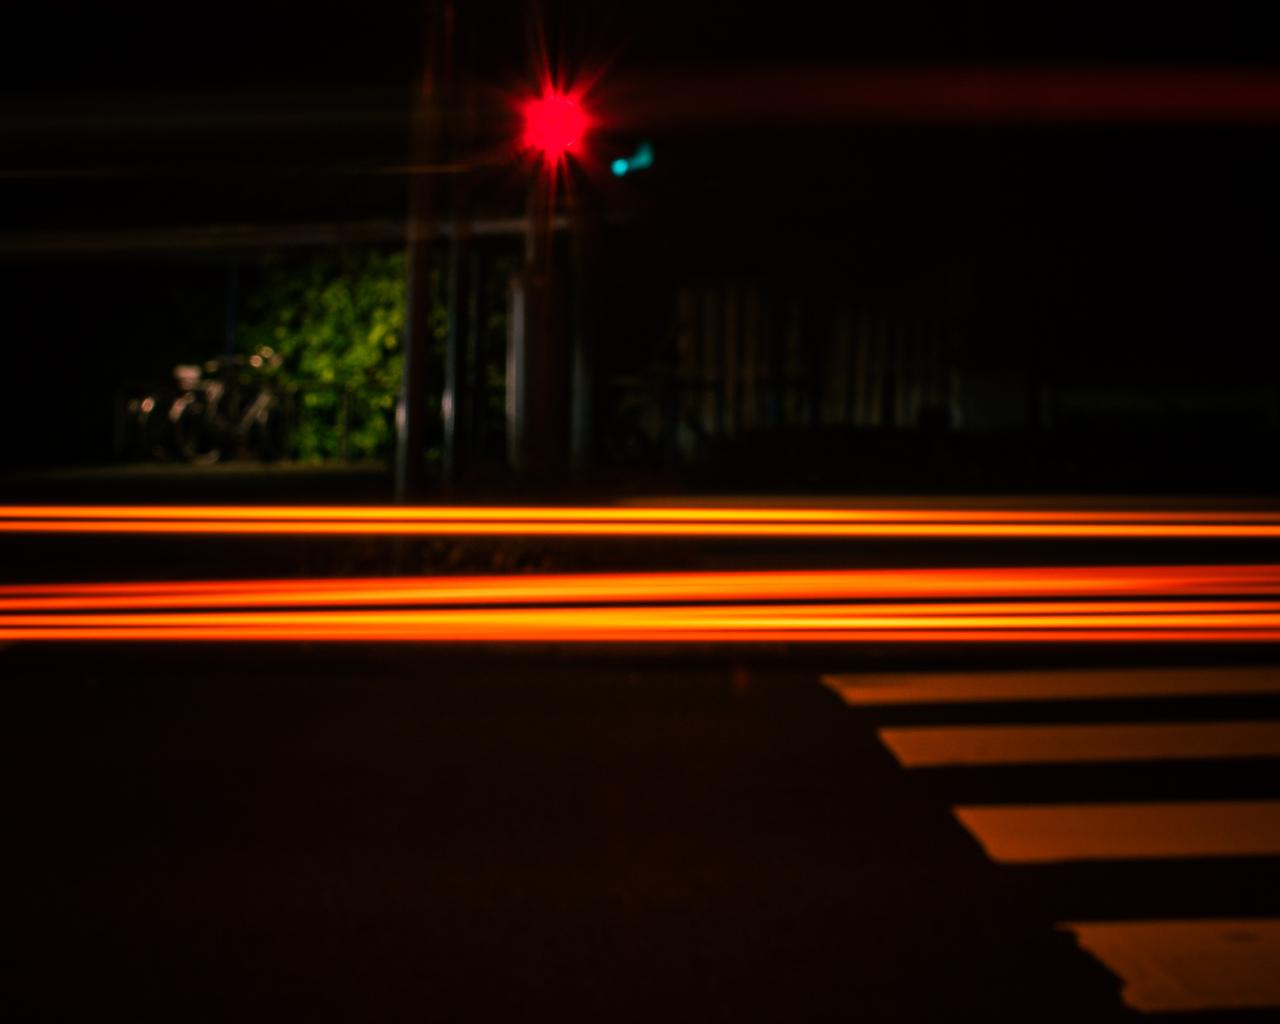 orange-trails-time-lapse-xj.jpg